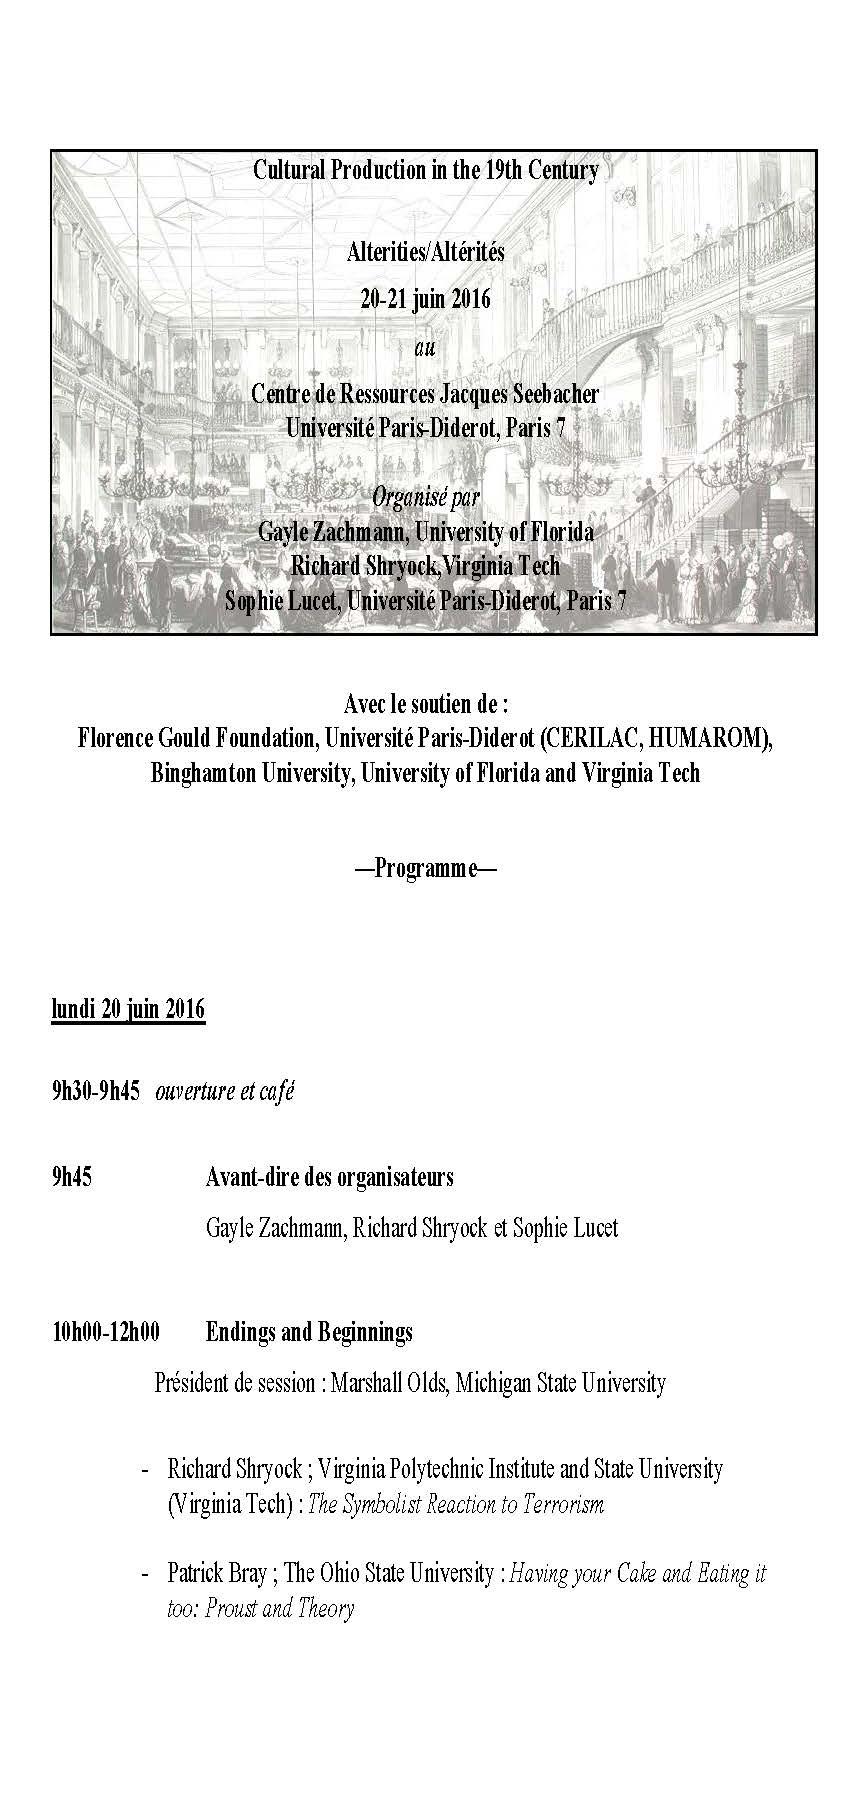 Aperçu du programme (première page) - Atelier 2016